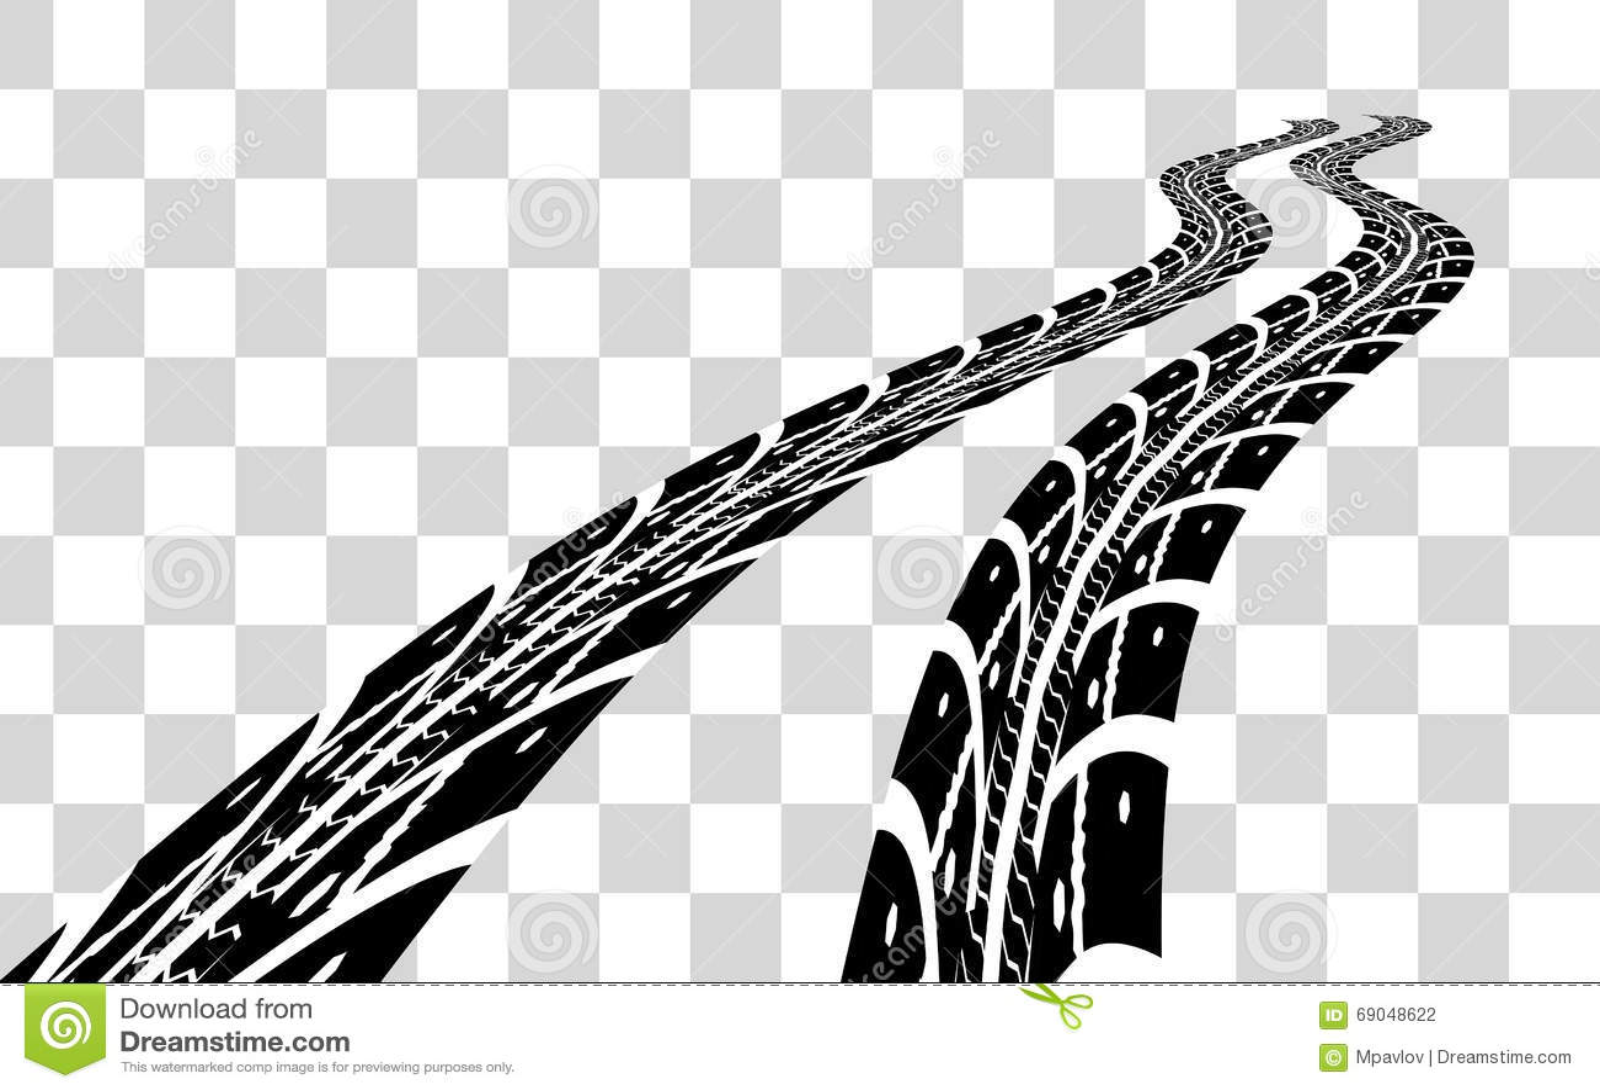 Tire Tracks Transparent Stock Illustrations 49 Tire Tracks Transparent Stock Illustrations Vectors Clipart Dreamstime